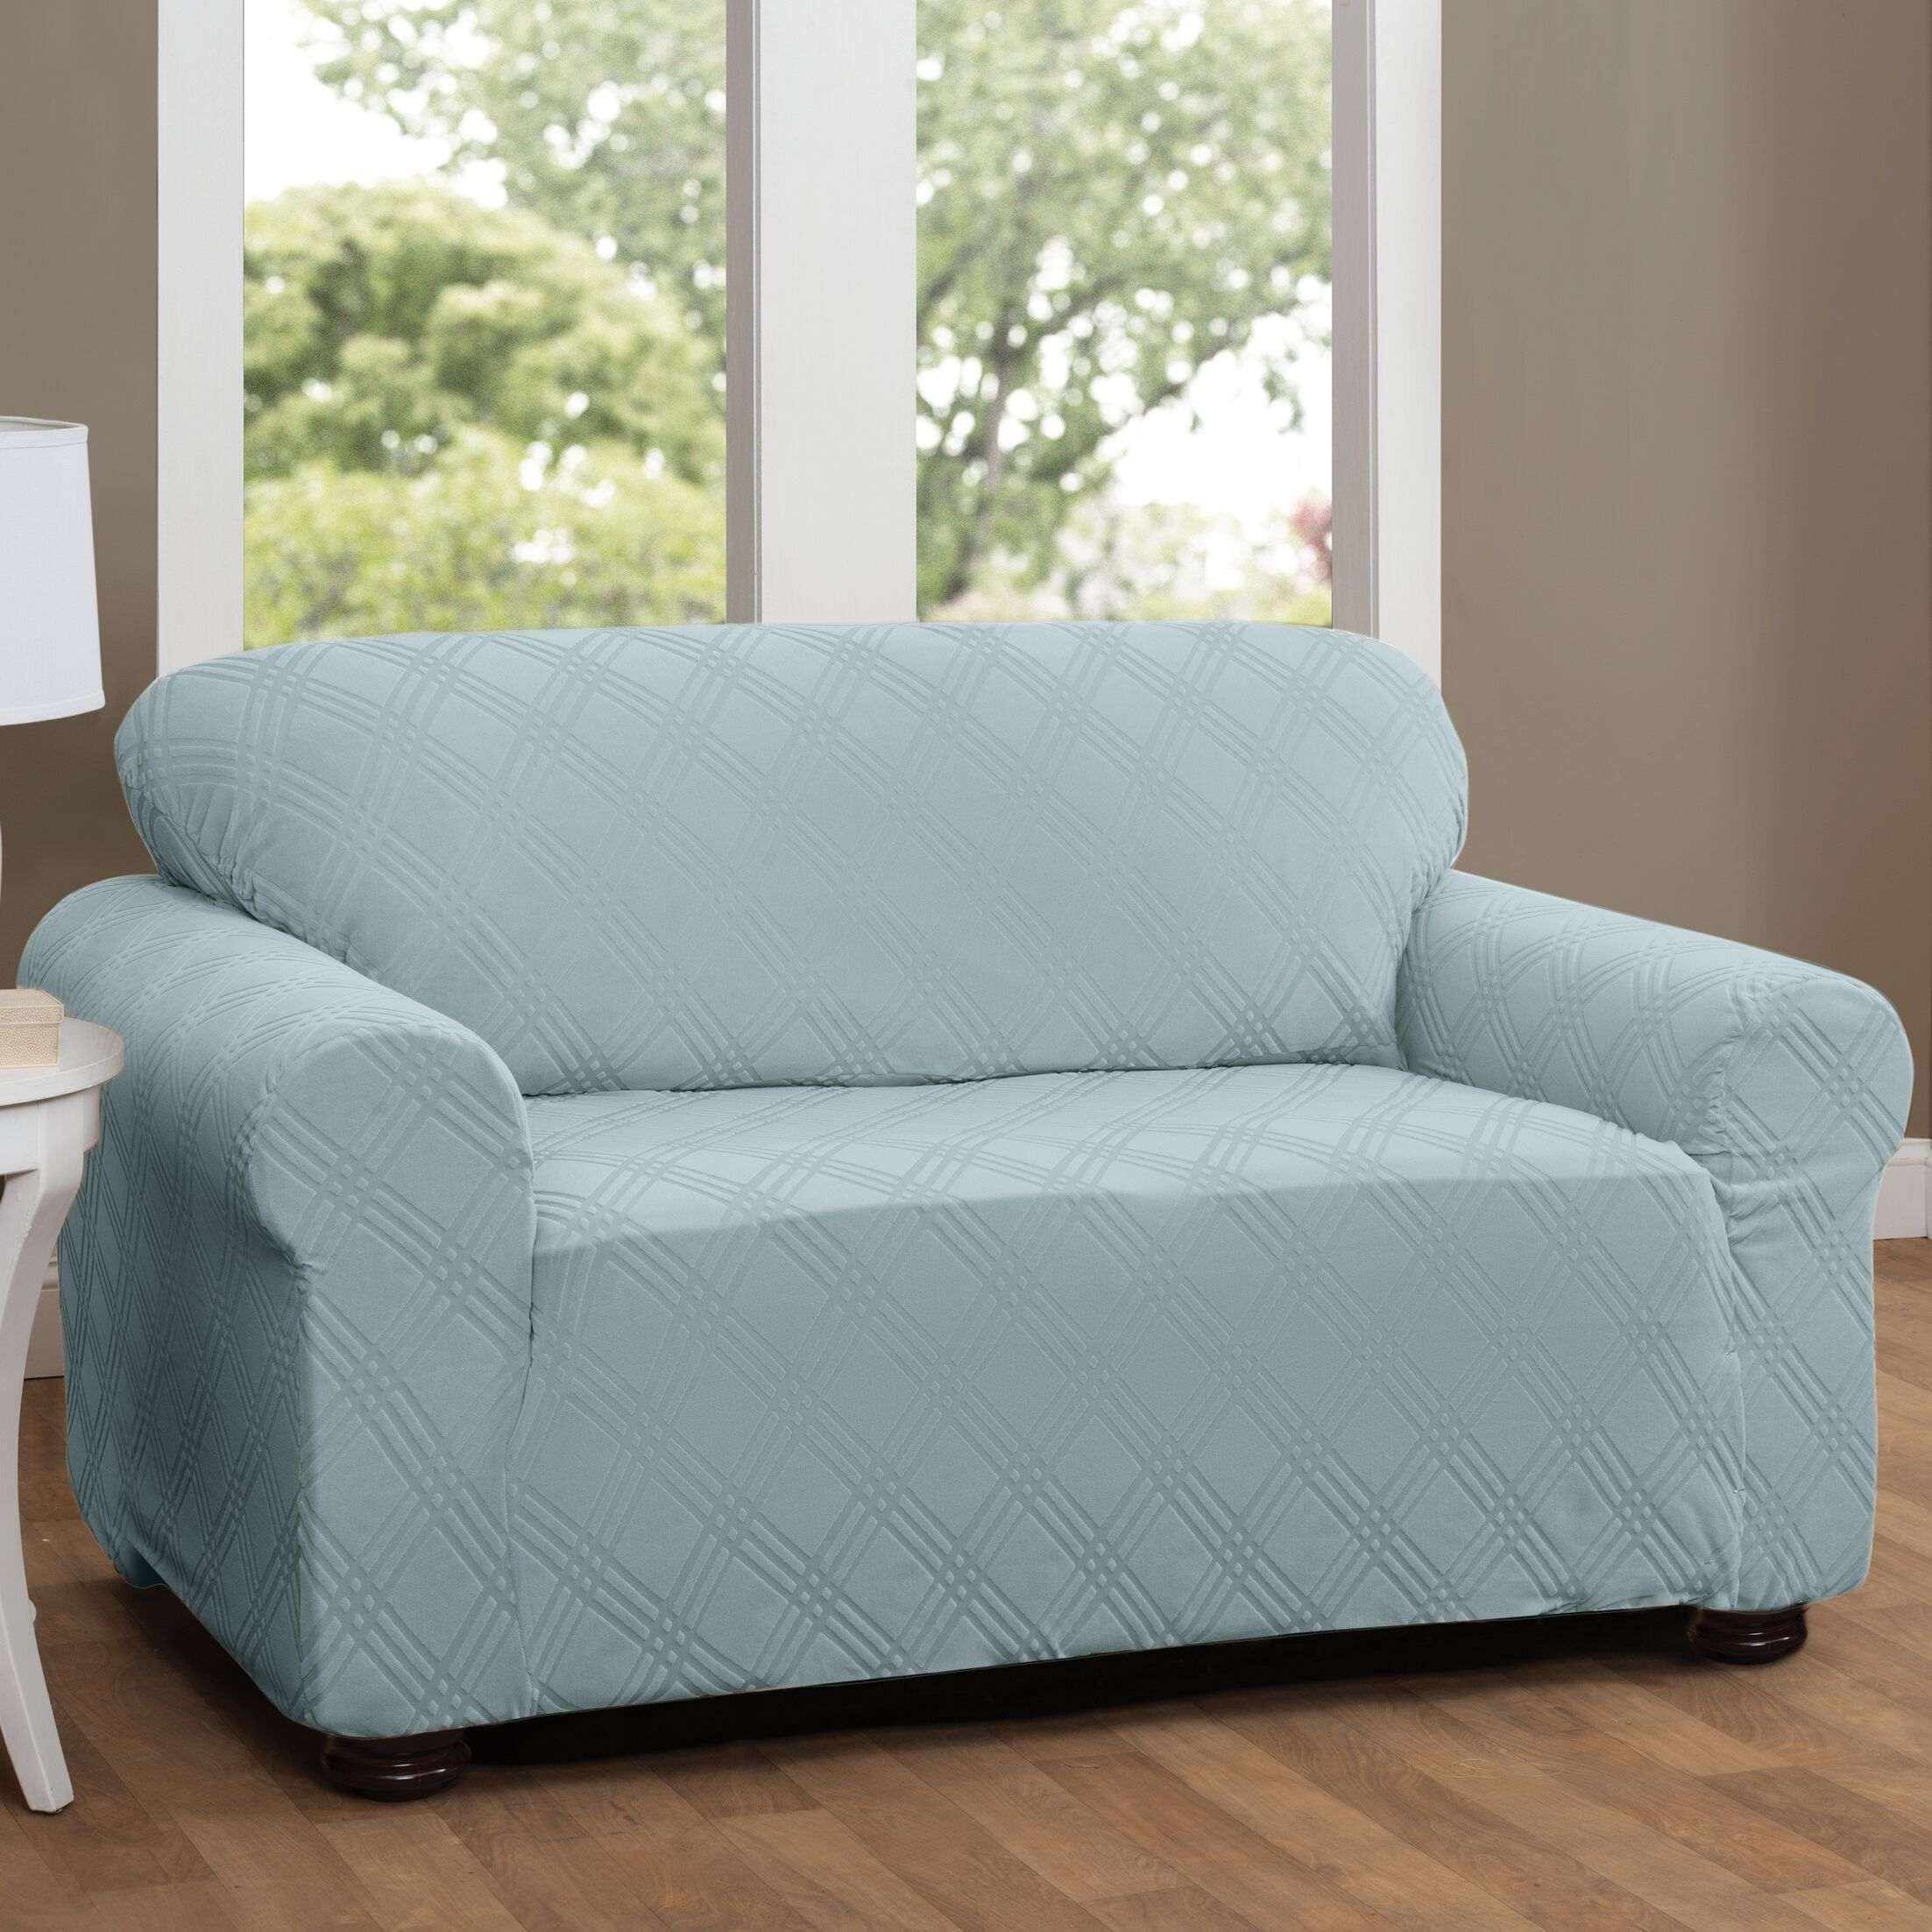 Double Diamond Sensations Box Cushion Sofa Slipcover Upholstery: Spa Blue